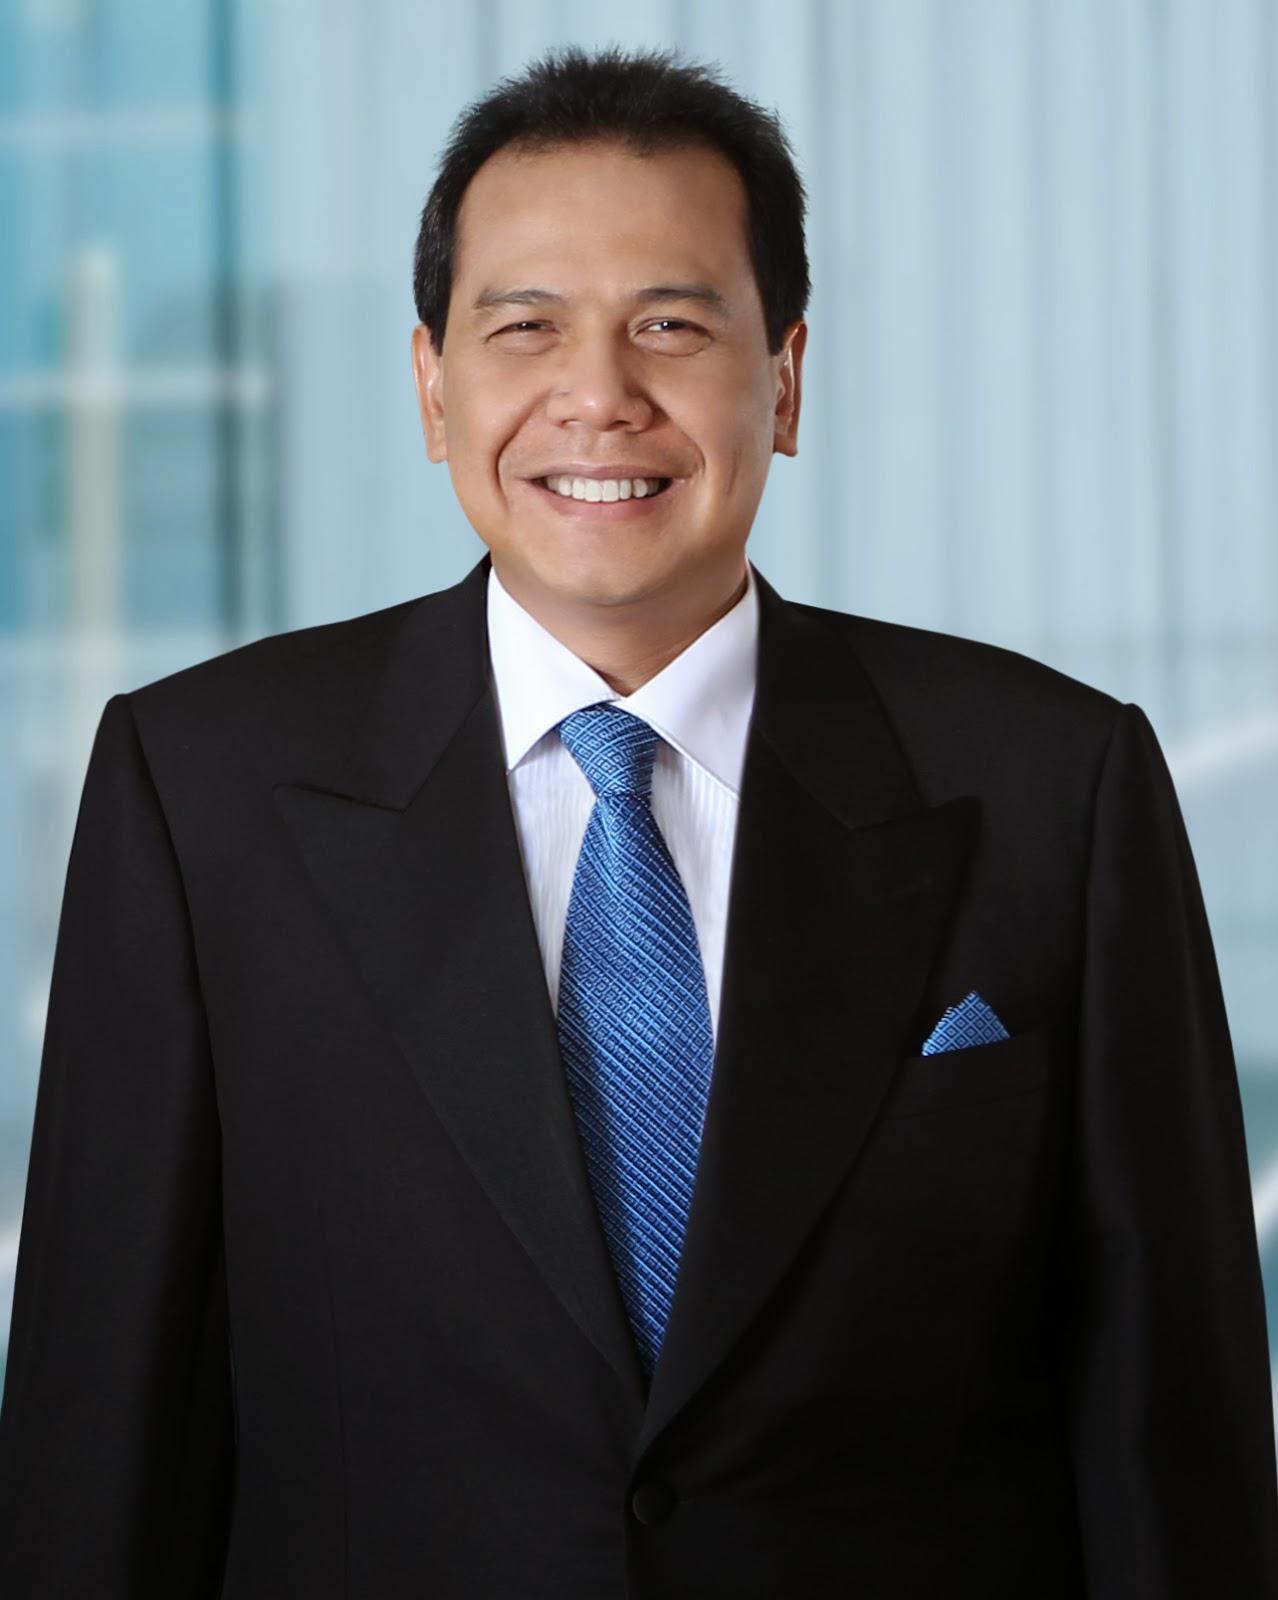 Biografi Chairul Tanjung - Pengusaha Besar Asal Indonesia   Kumpulan ...